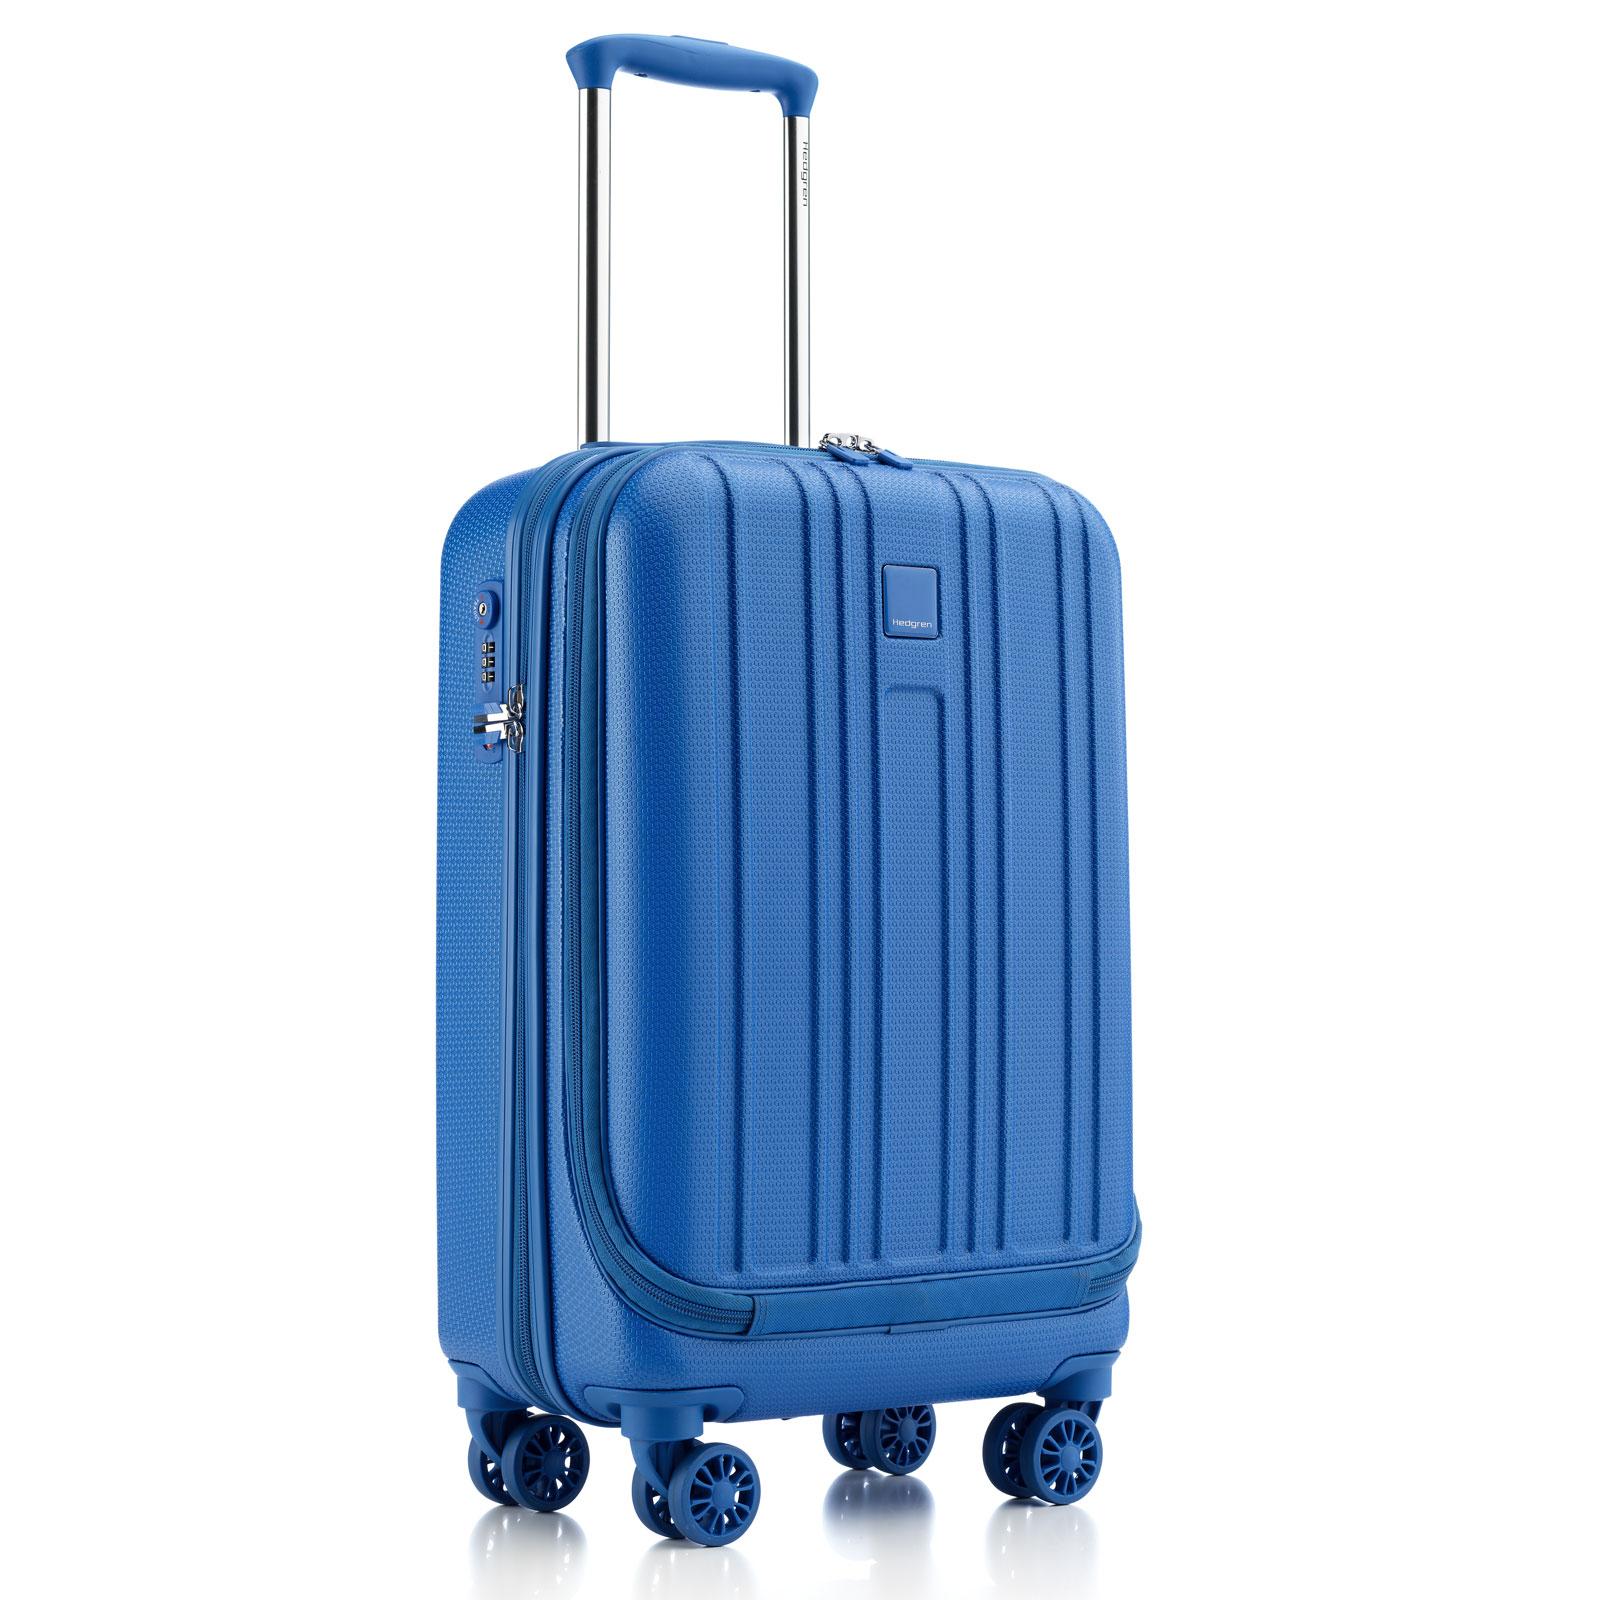 Hedgren transit boarding s bleu fonc sac sacoche for Valise makita avec tous ses accessoires